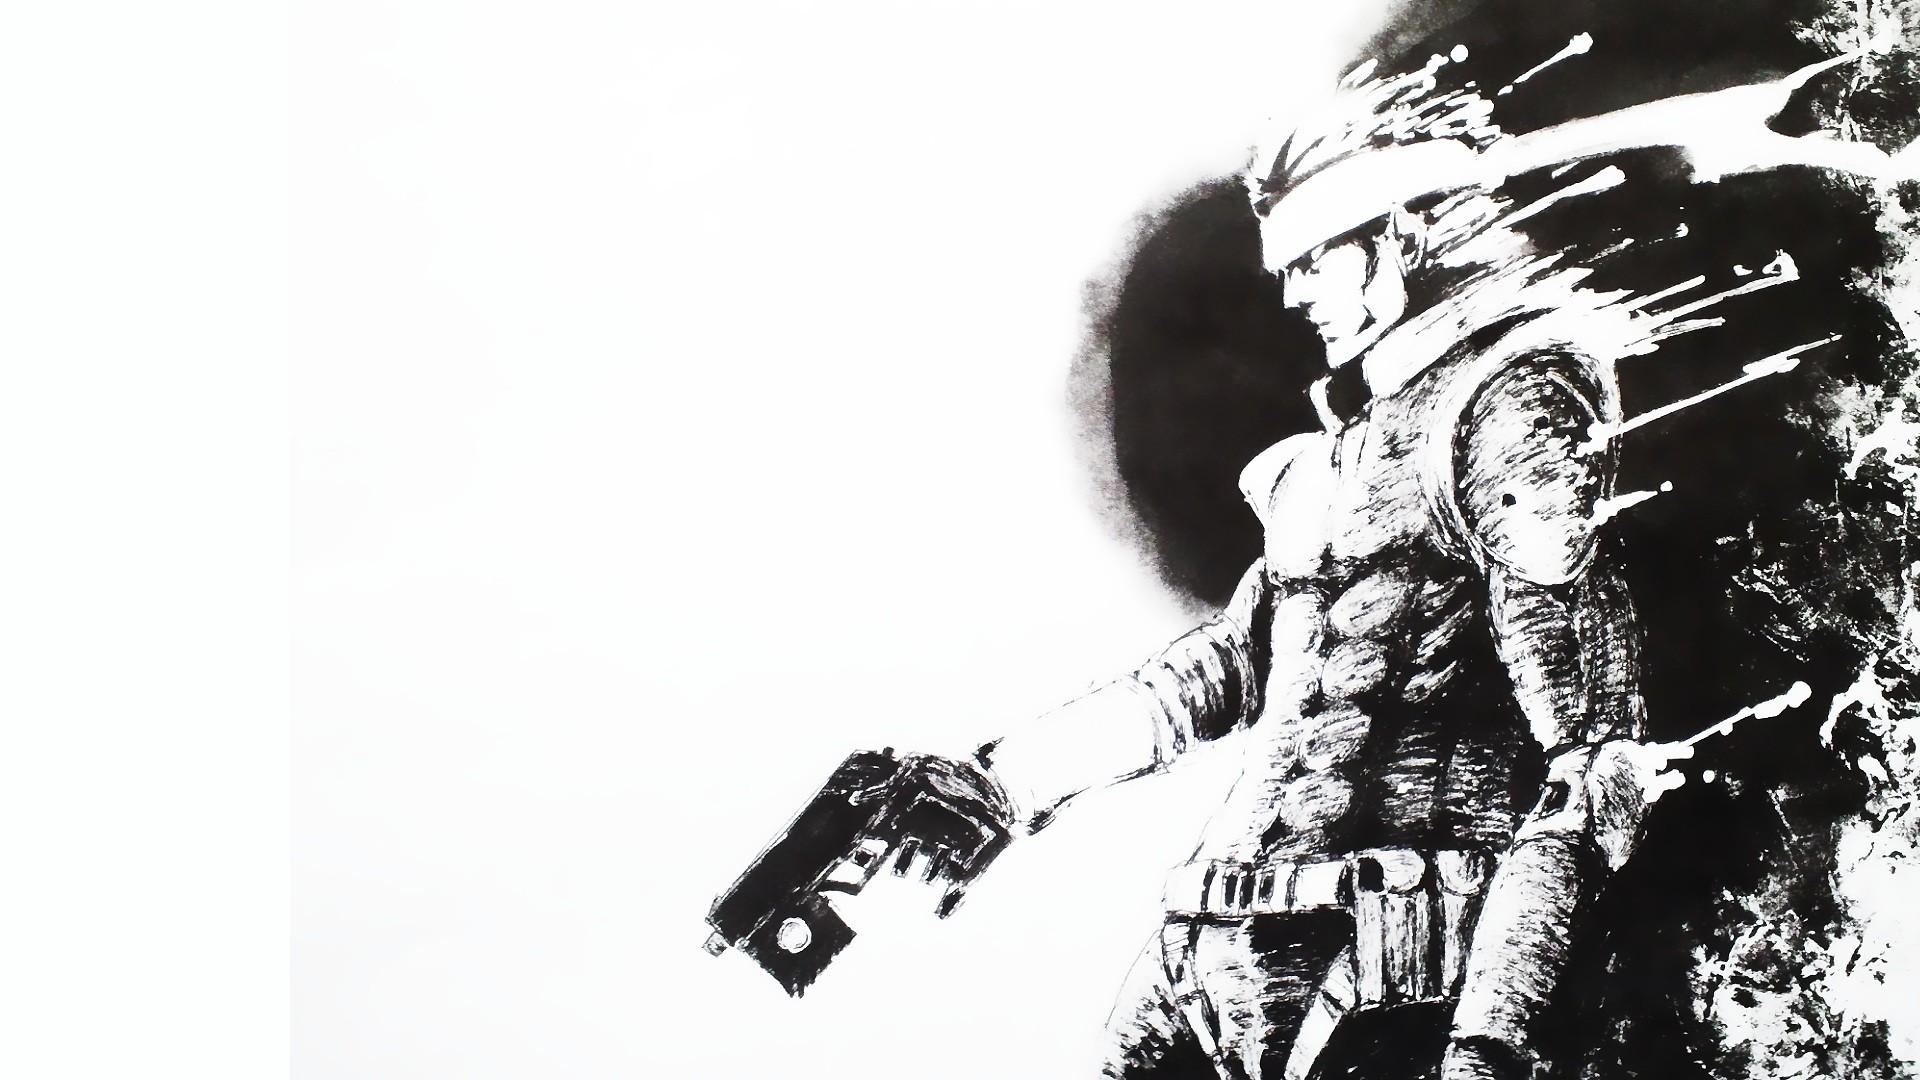 … hd pictures; metal gear solid wallpaper 2990 umad com …